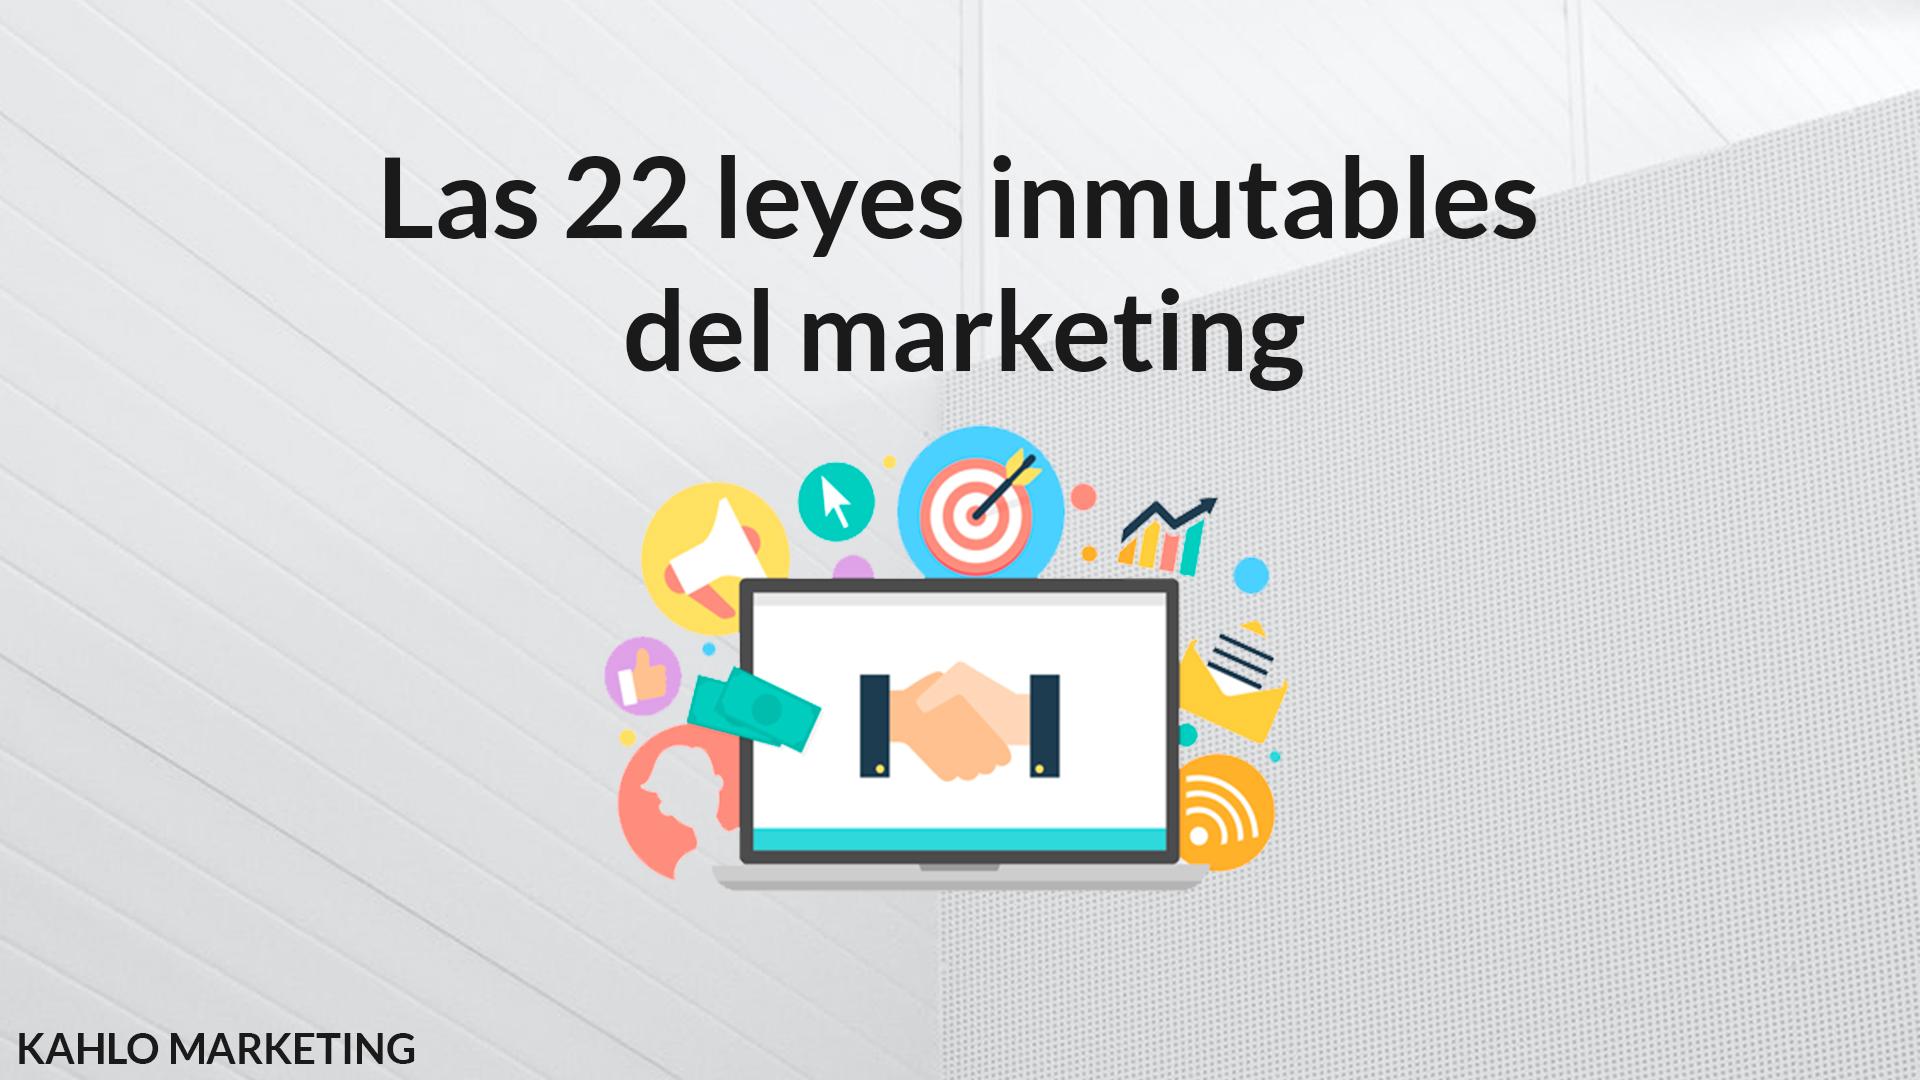 Kahlo Marketing Pontevedra 2021 - Las 22 leyes inmutables del marketing.